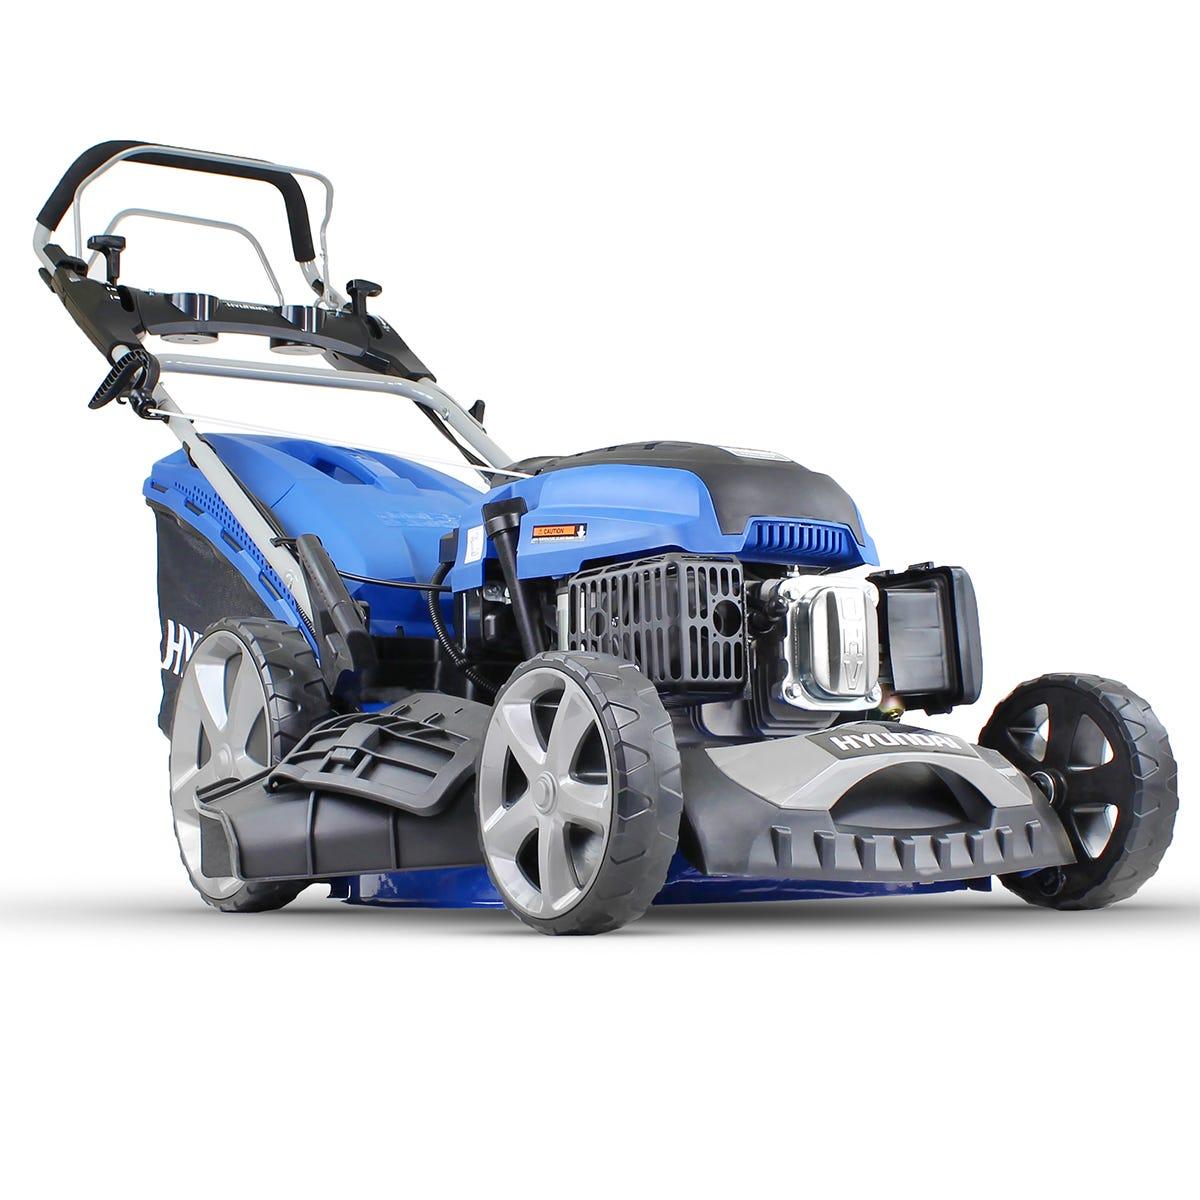 Image of Hyundai HYM510SPE 173 cc Self Propelled Electric Push Button Start Petrol Lawnmower